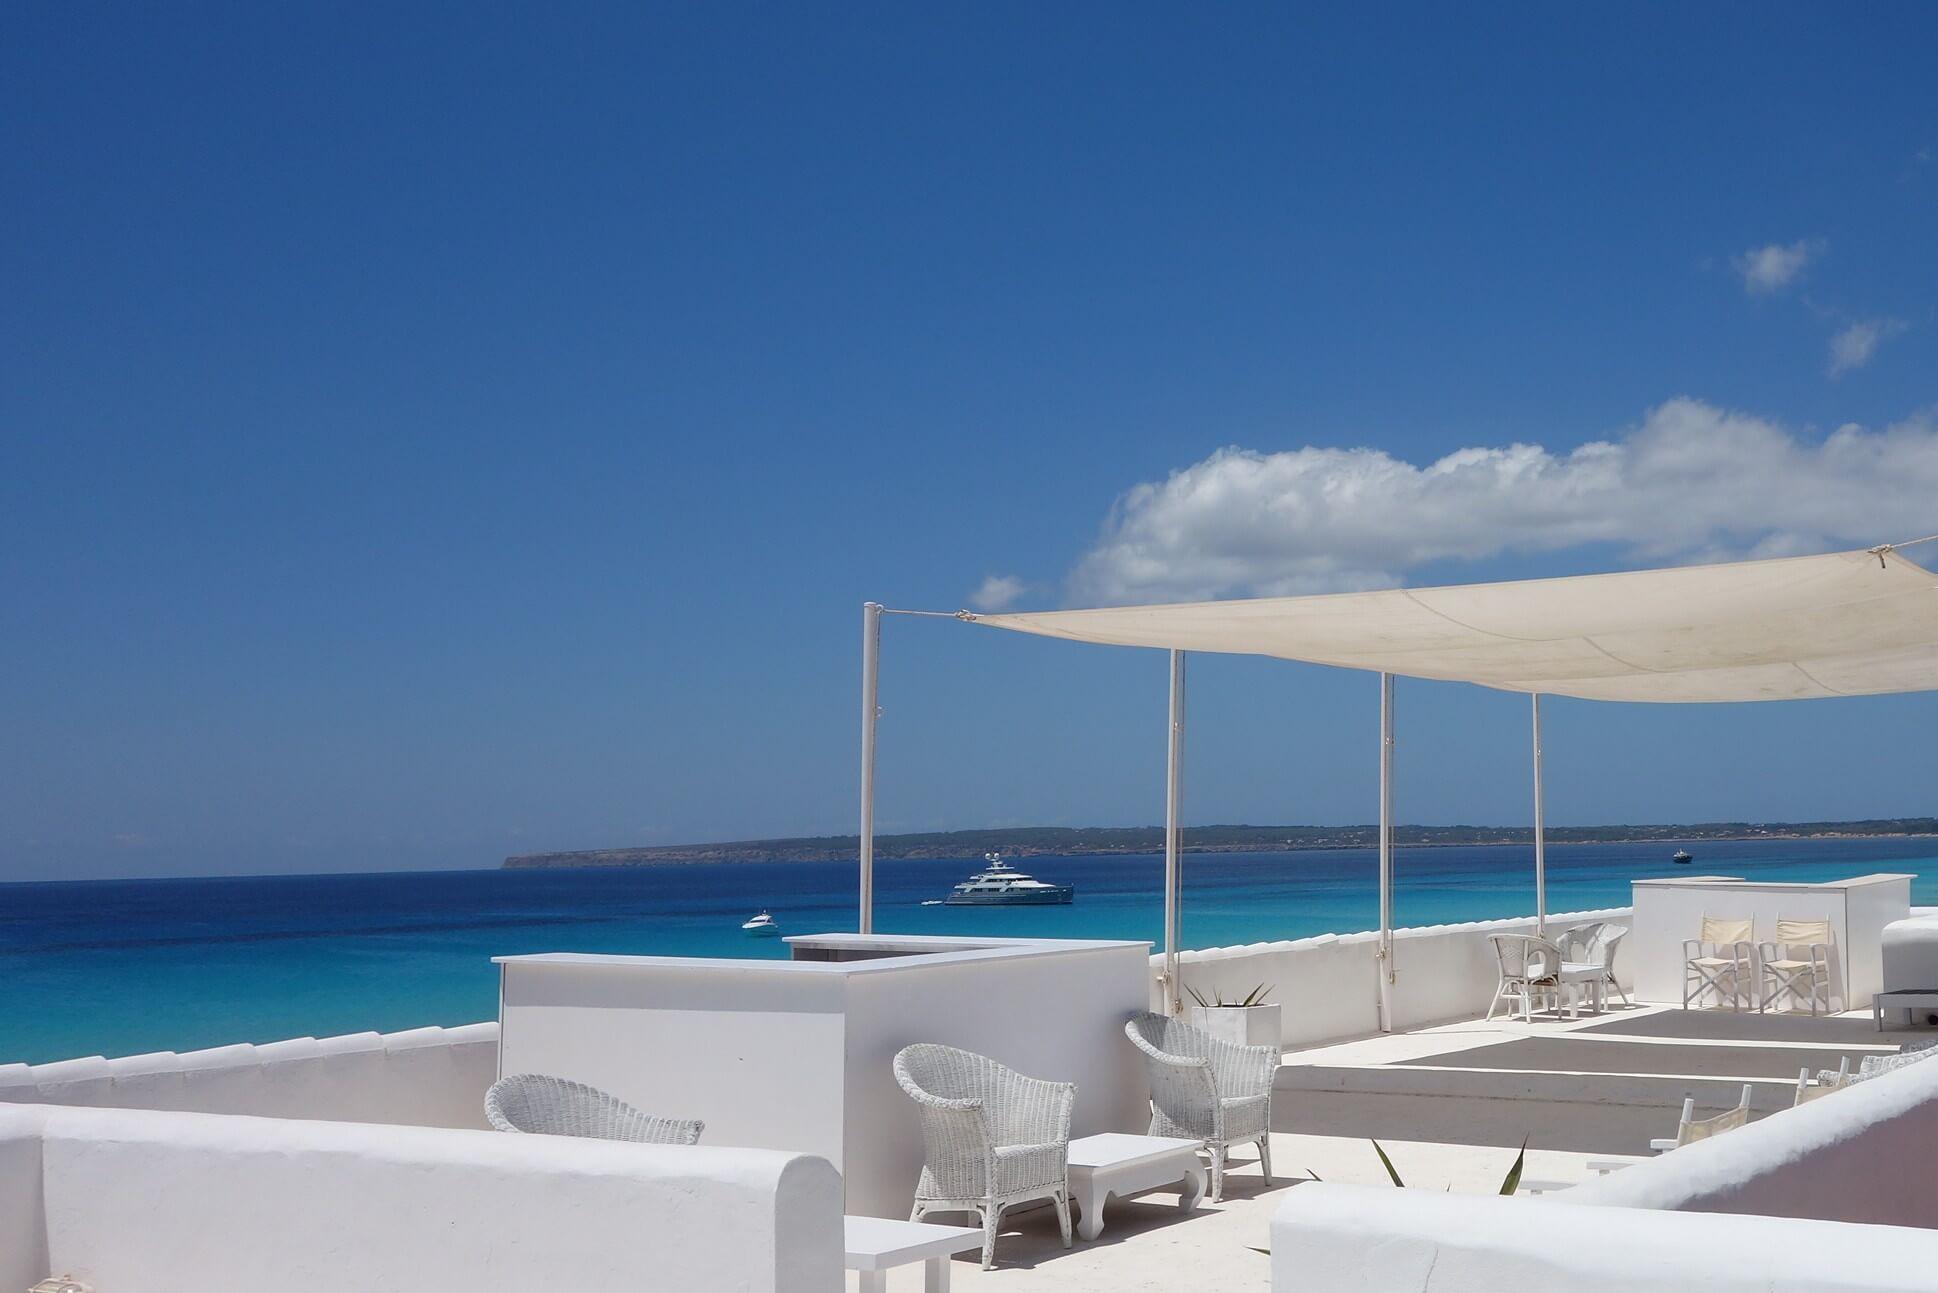 https://www.white-ibiza.com/wp-content/uploads/2020/03/formentera-beach-restaurants-10-punto7-2020-02.jpg